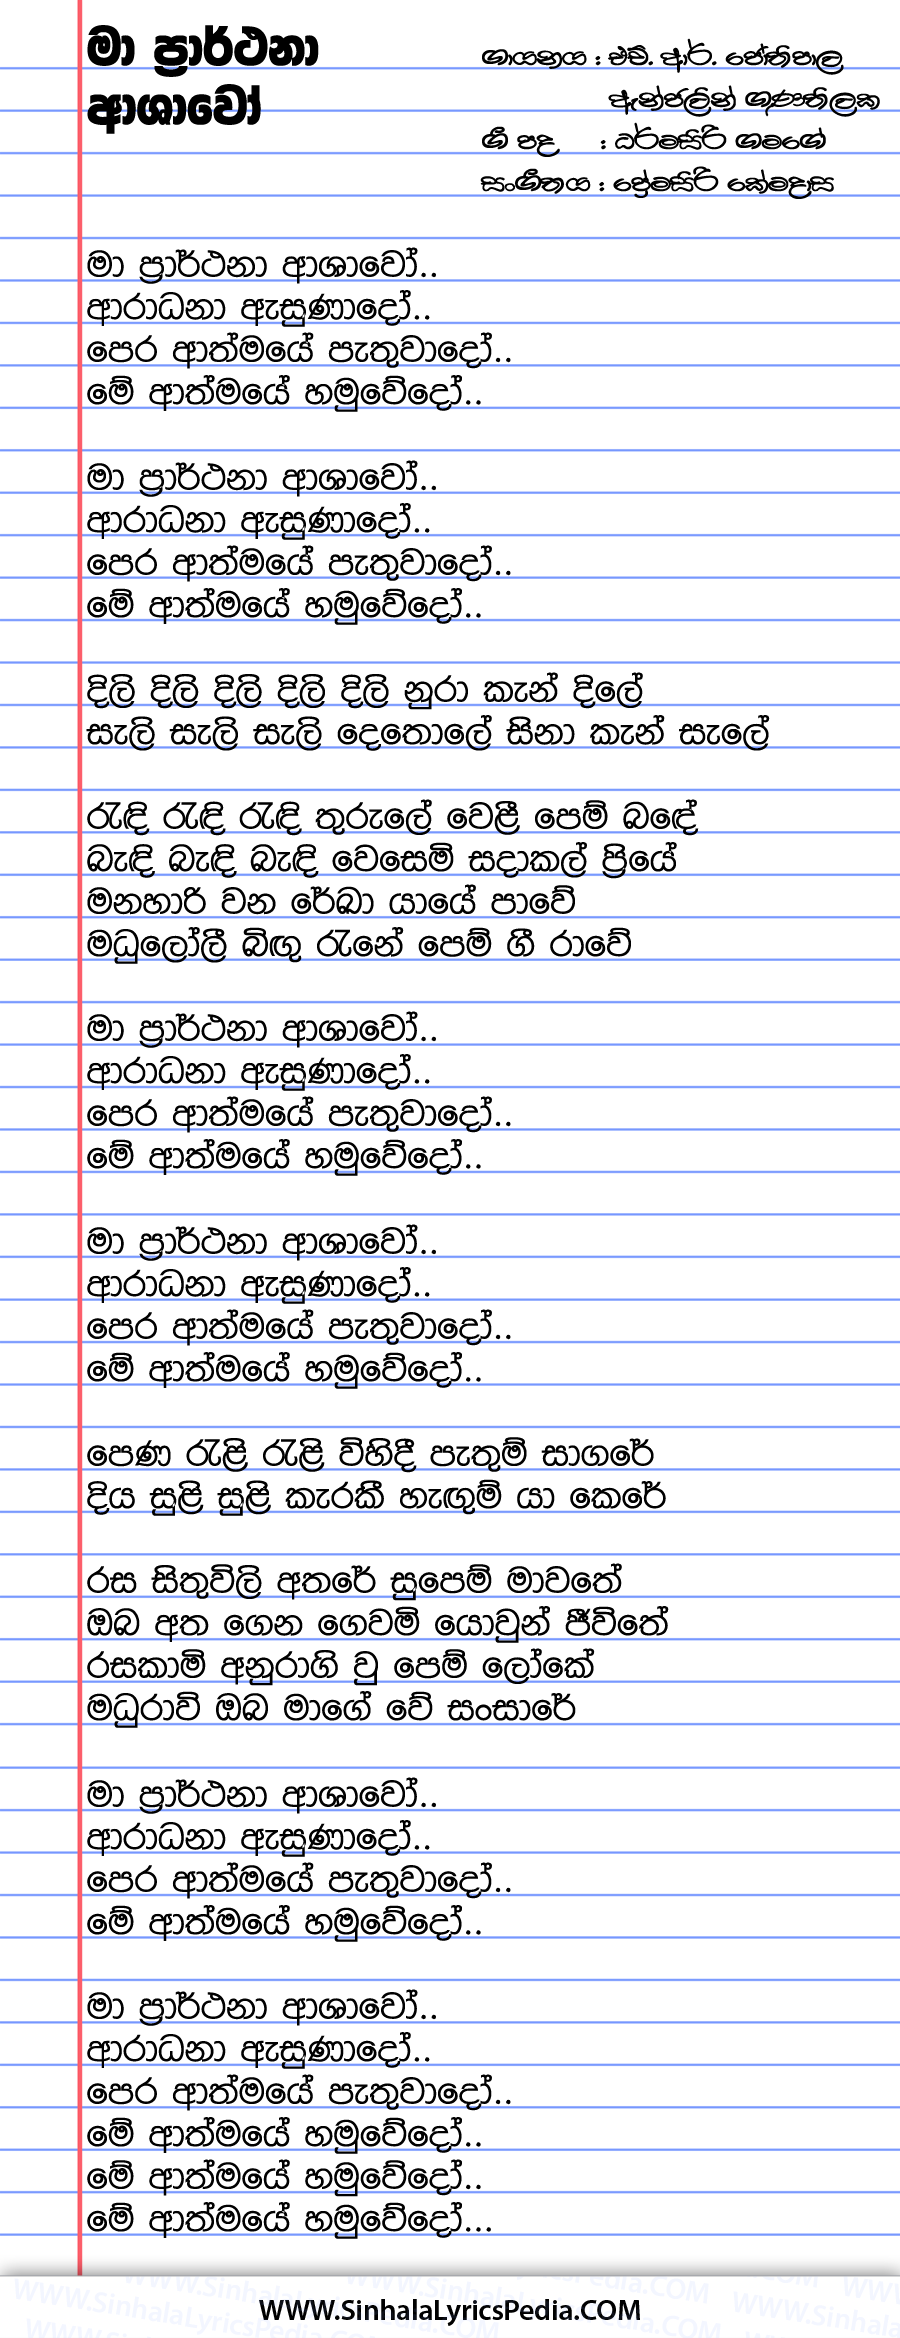 Ma Prarthana Ashawo Song Lyrics